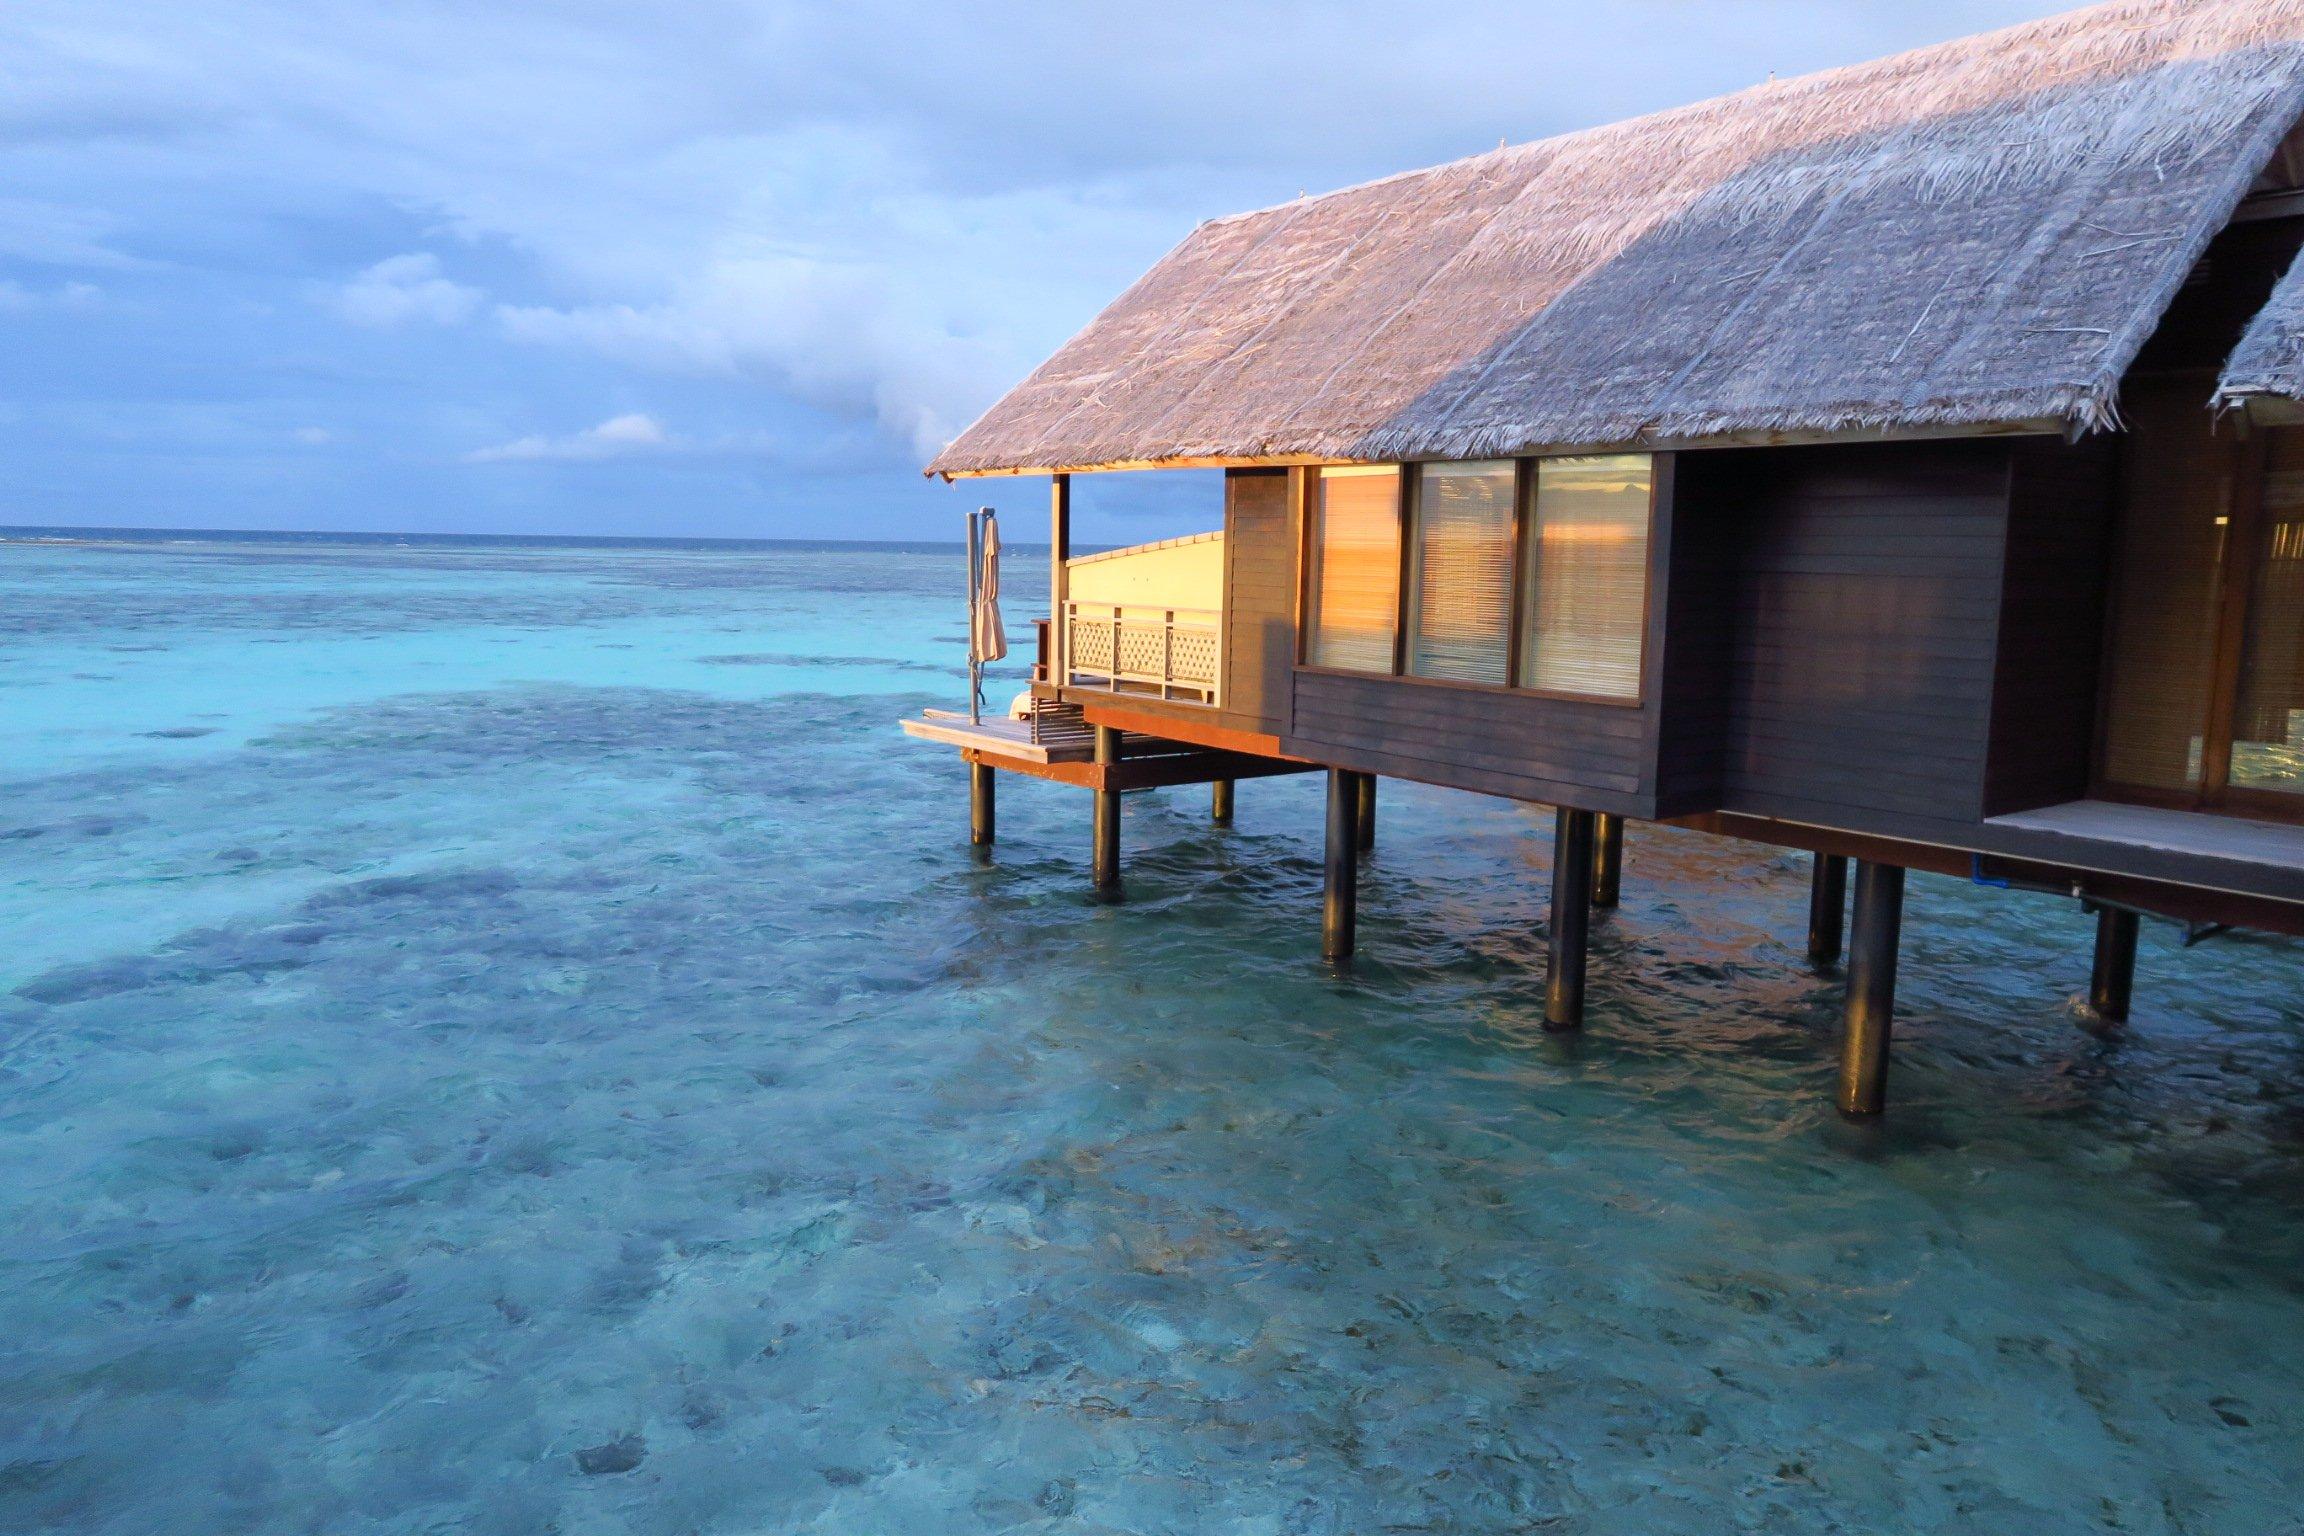 Maldives Shangri-La Water Villa